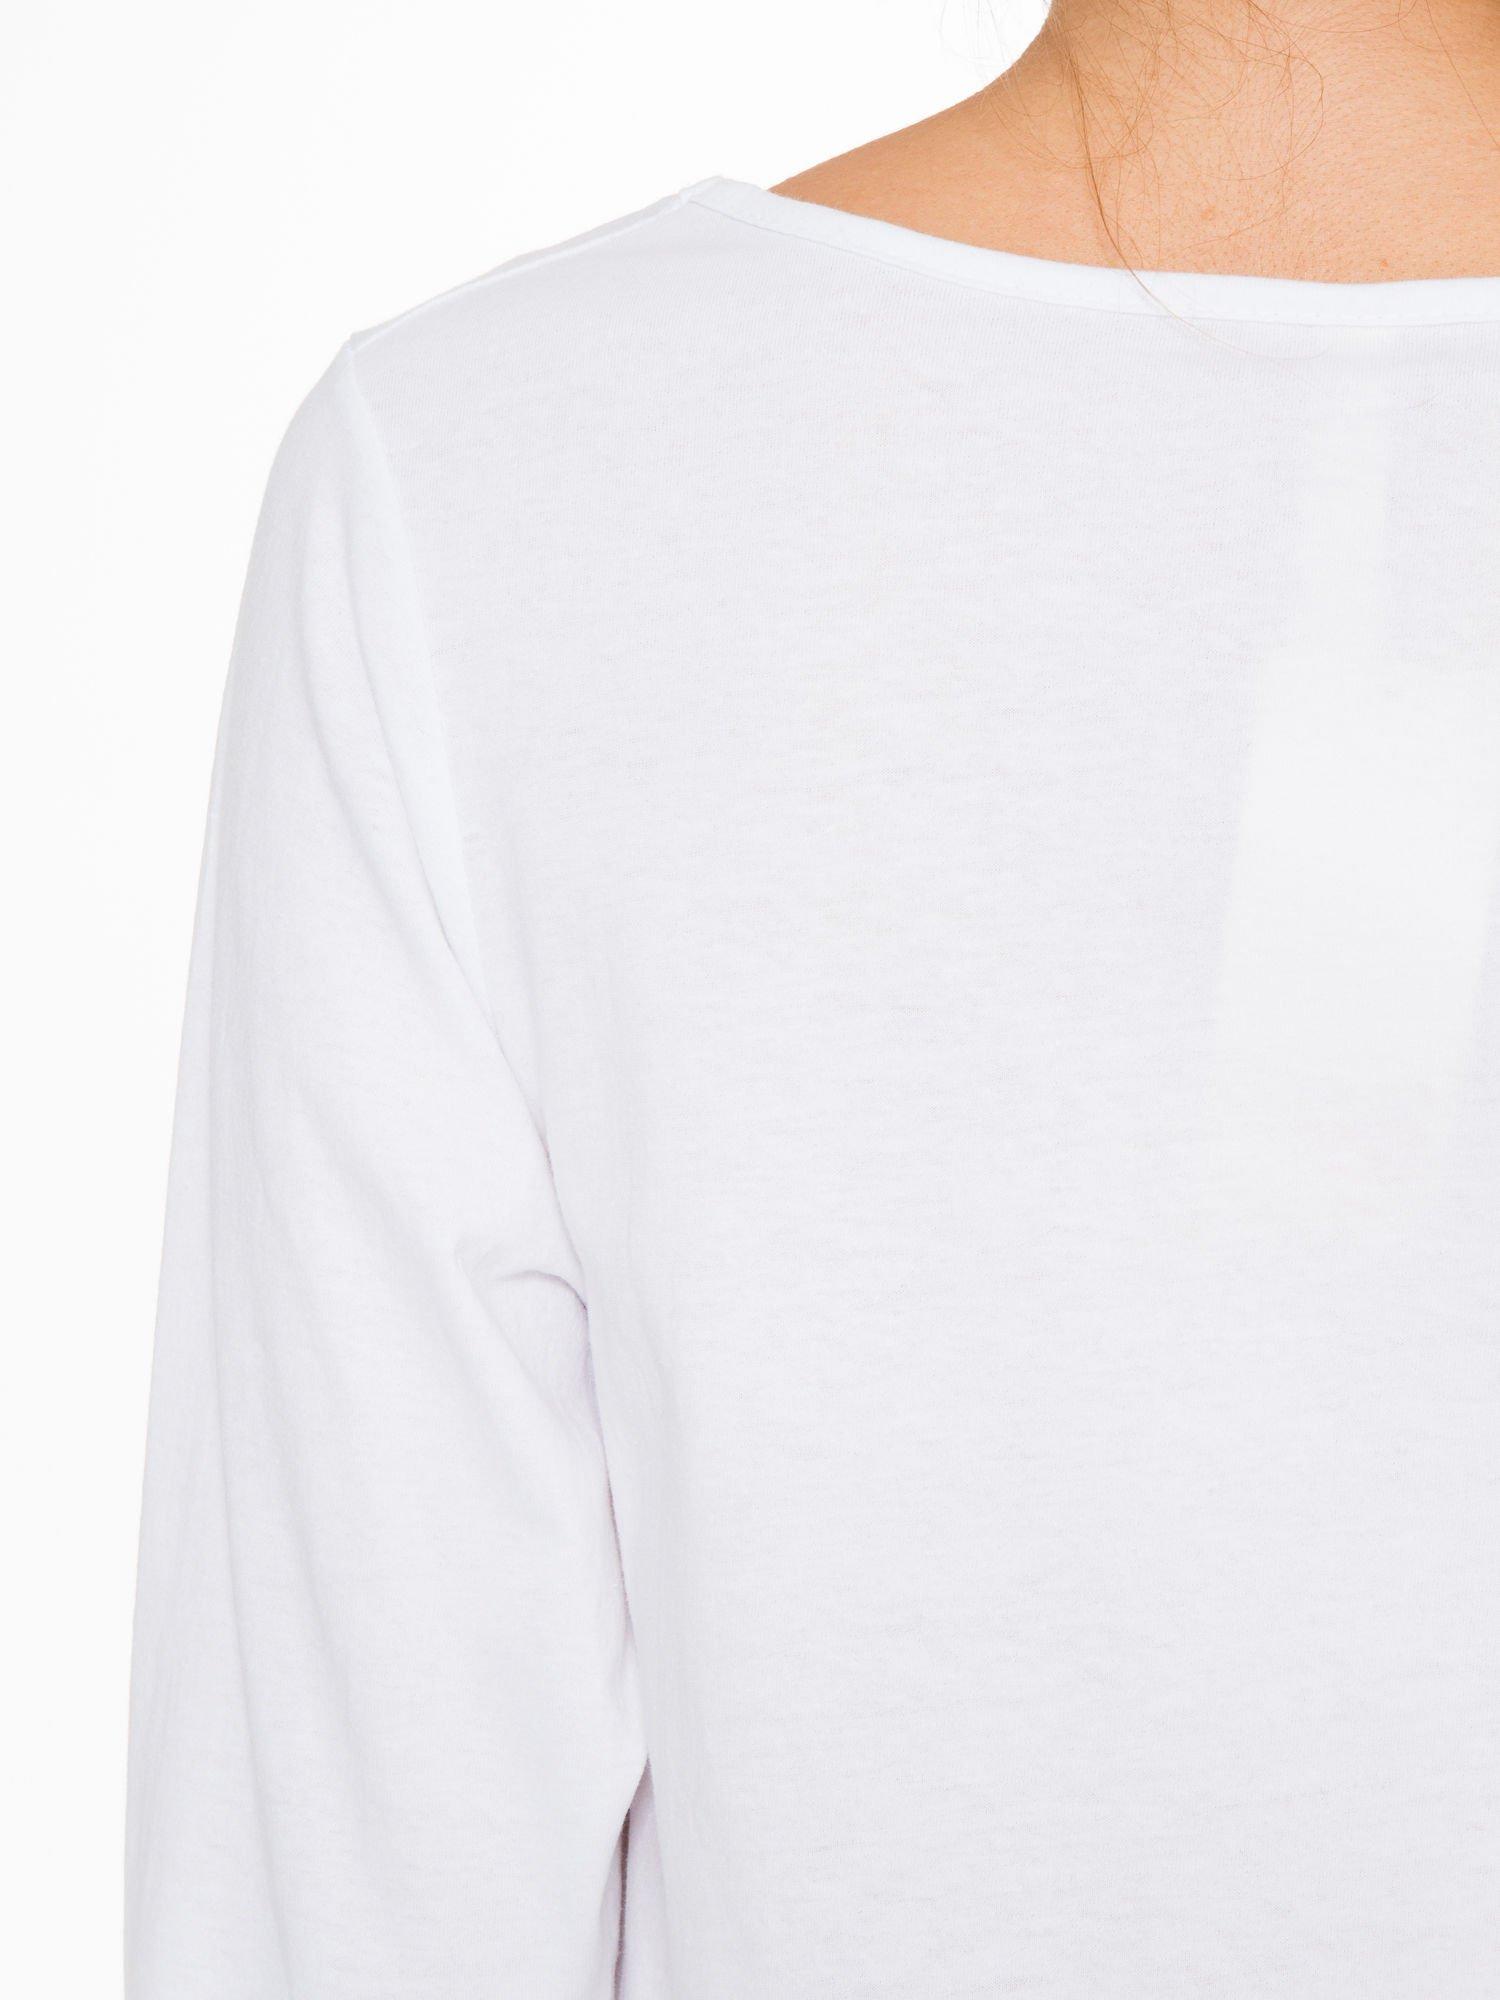 Biała bluzka z nadrukiem kotka i napisem JUST WANNA HAVE FUN?                                  zdj.                                  9